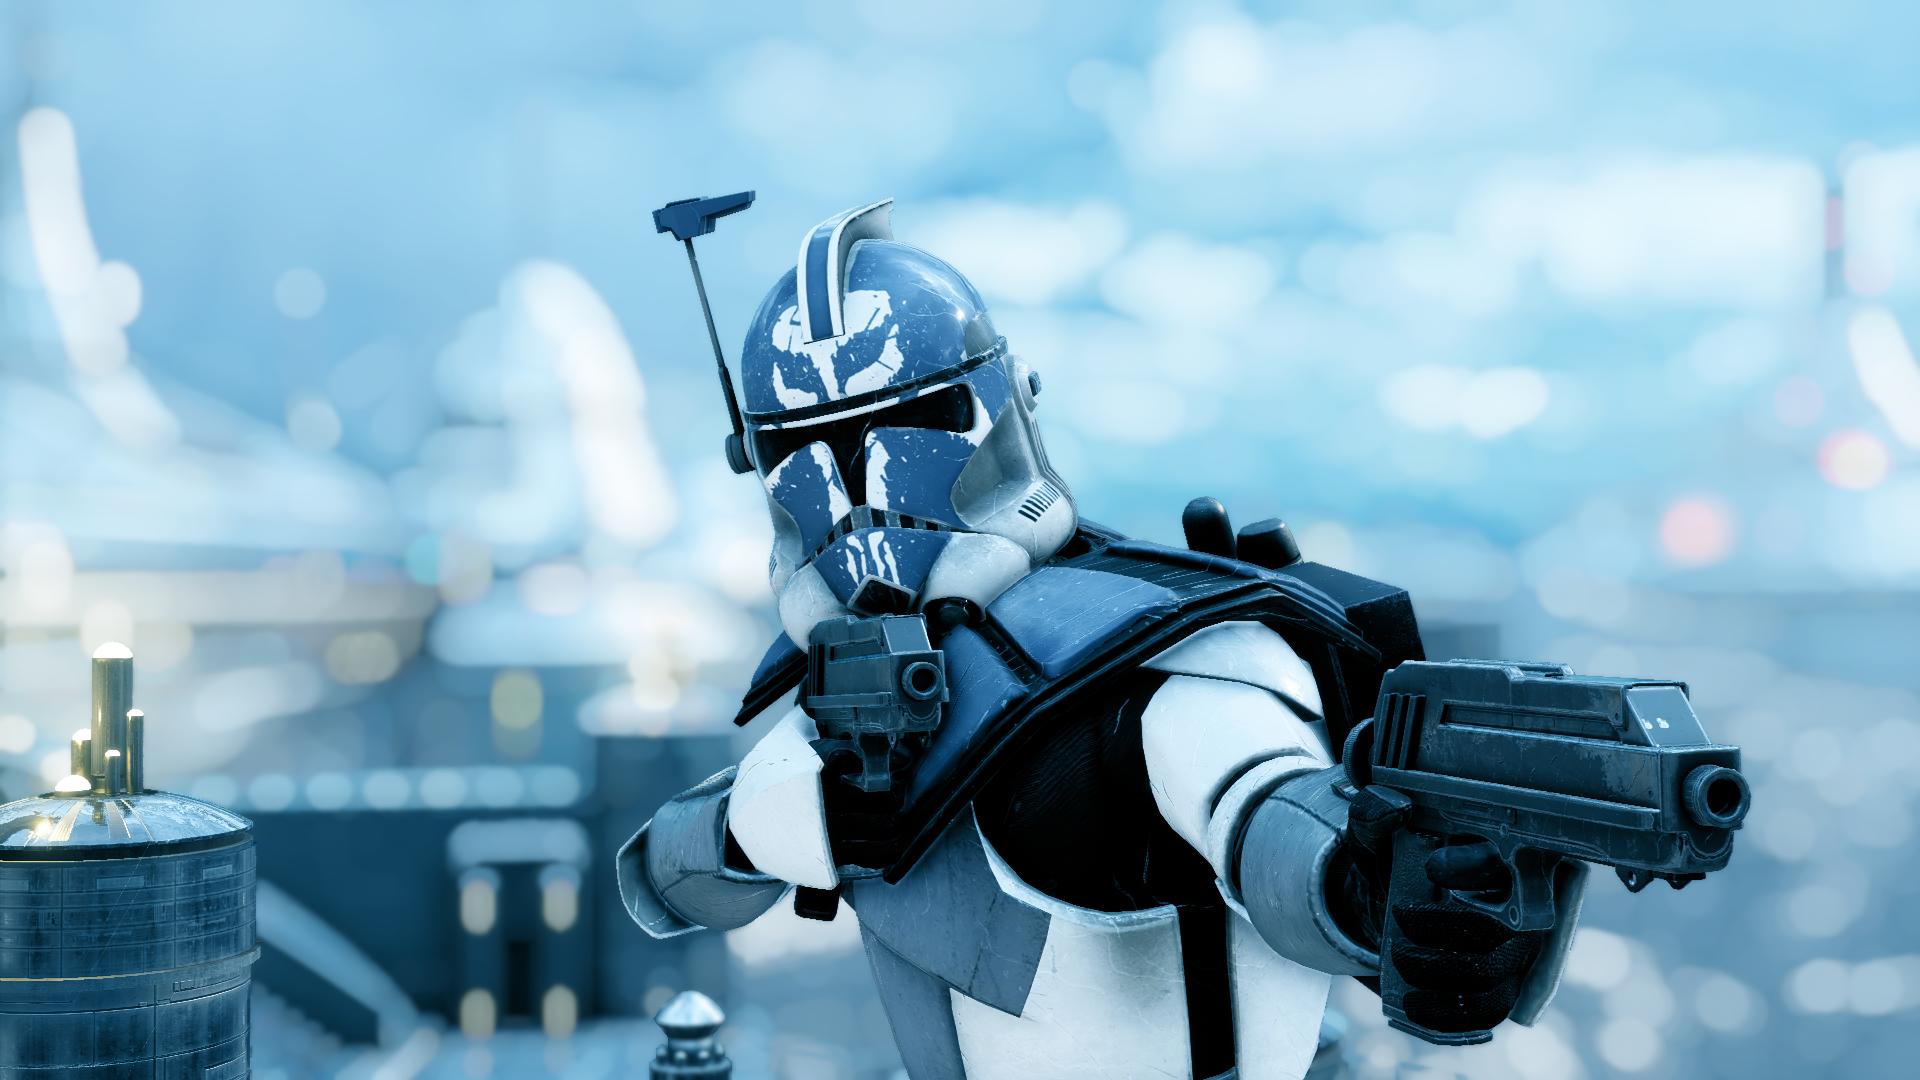 104th Arc Trooper Pack At Star Wars Battlefront Ii 2017 Nexus Mods And Community Star Wars Clone Wars Star Wars Pictures Star Wars Trooper